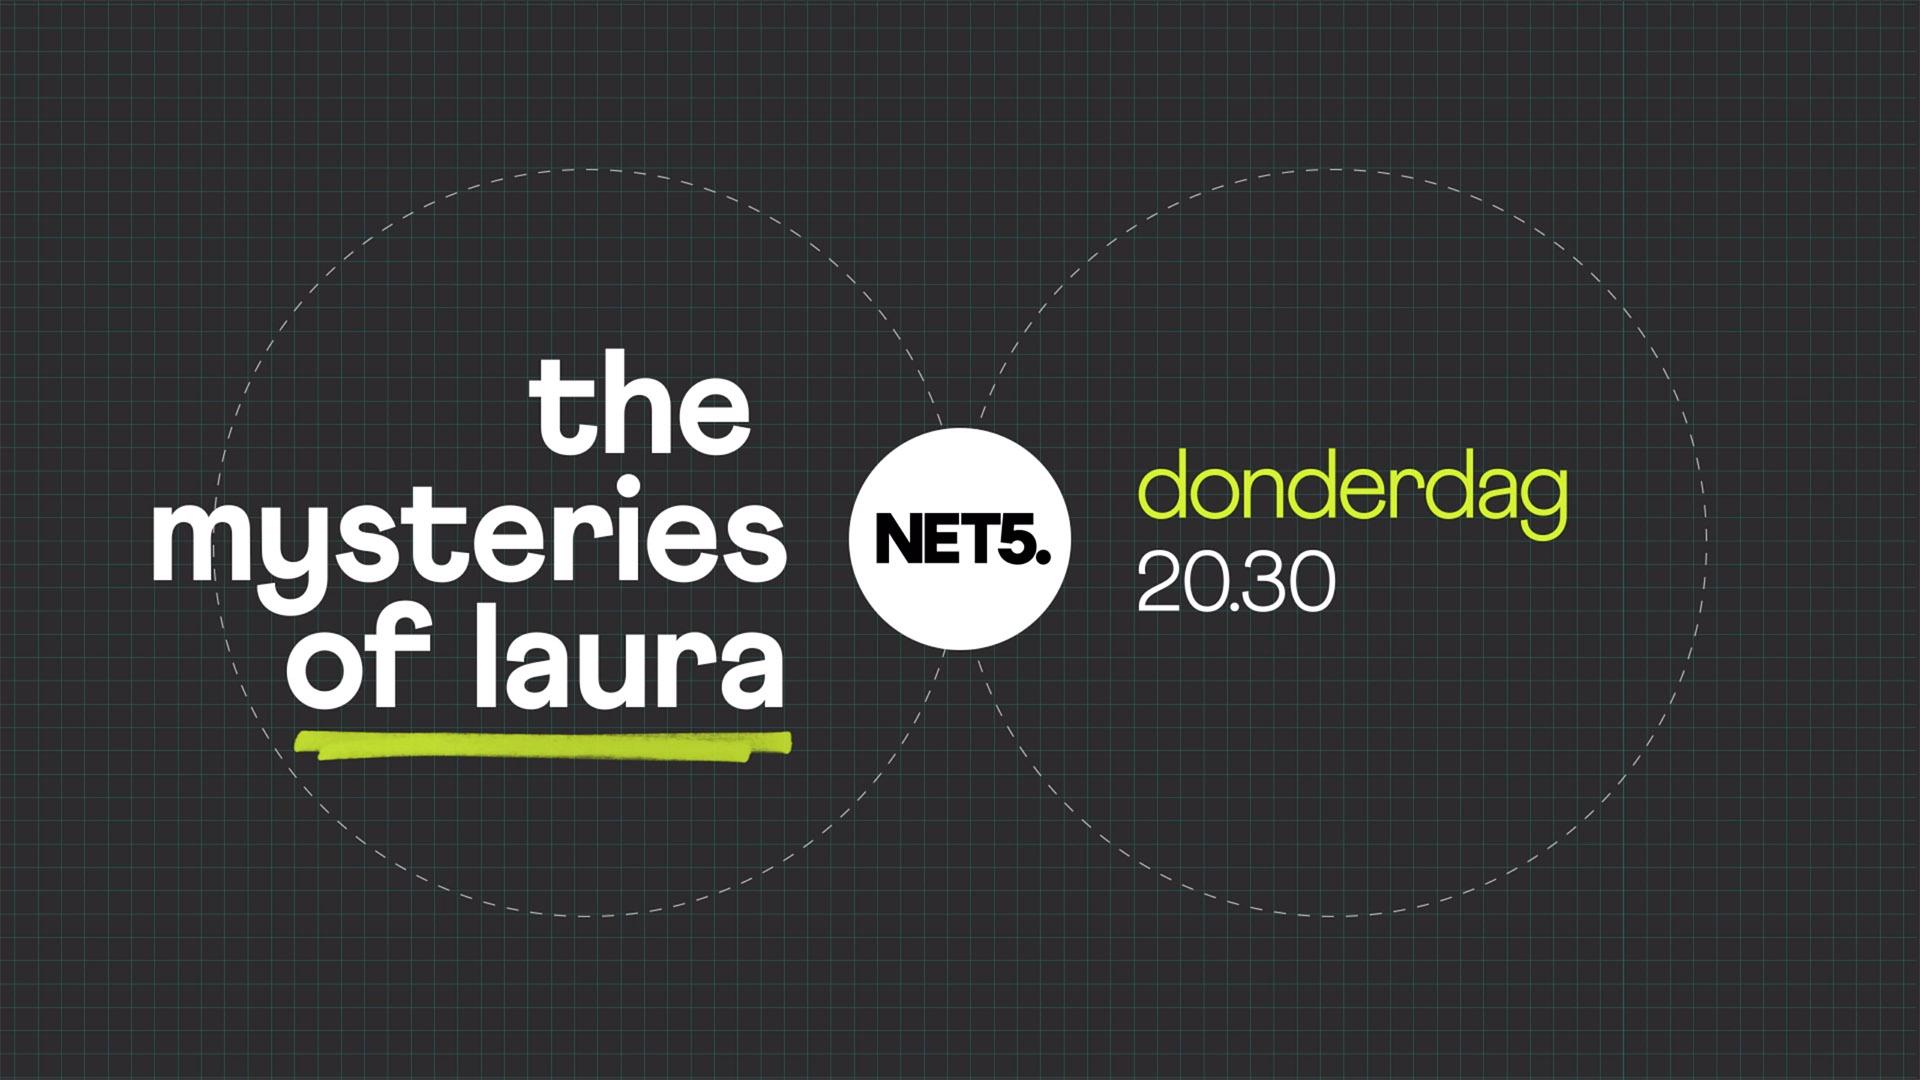 Net5 channel brand system ident leader opener closer